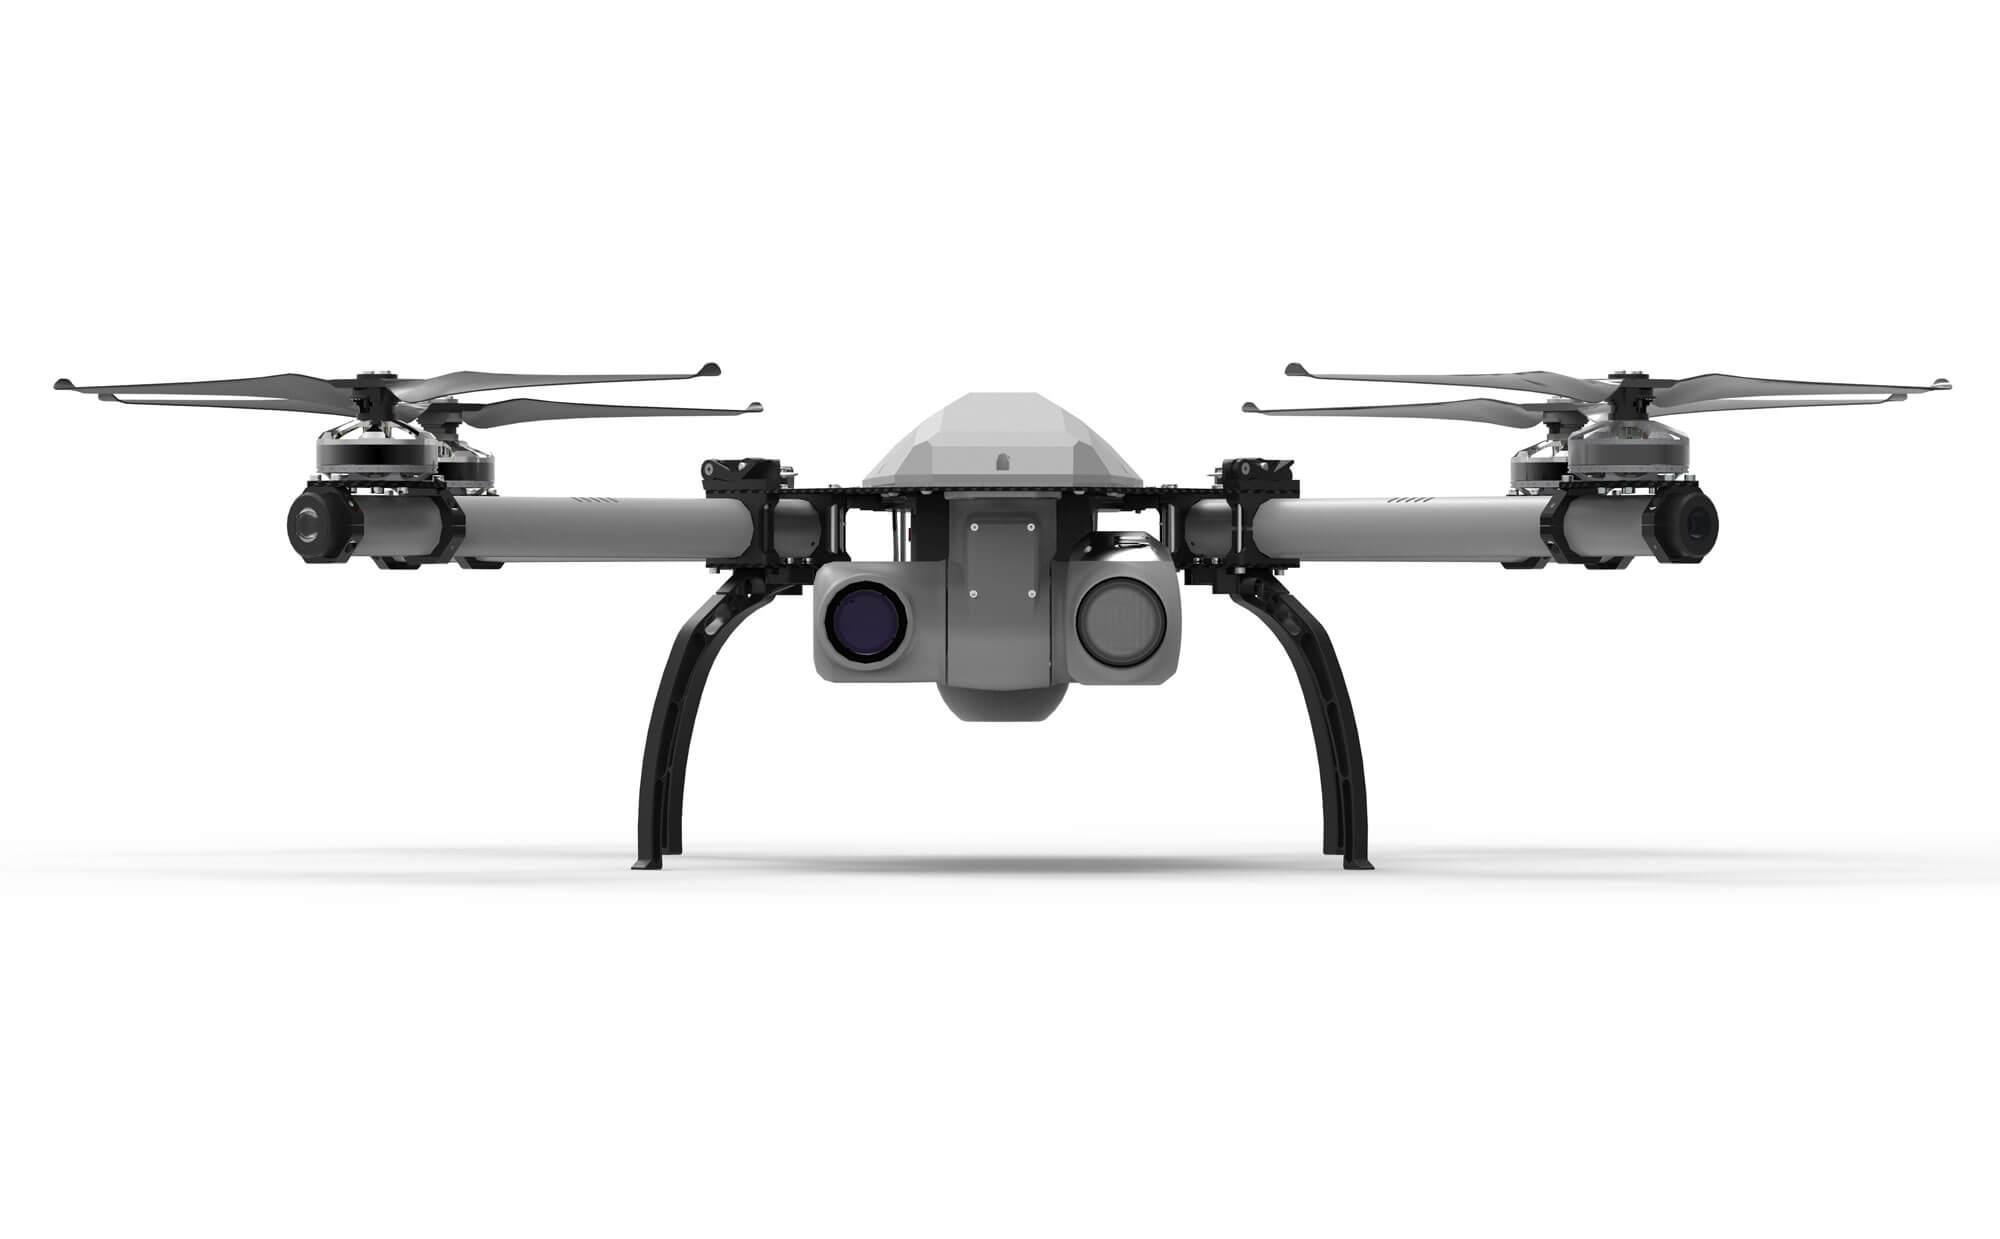 KX-4 INTERCEPTOR Threod Systems - Drones